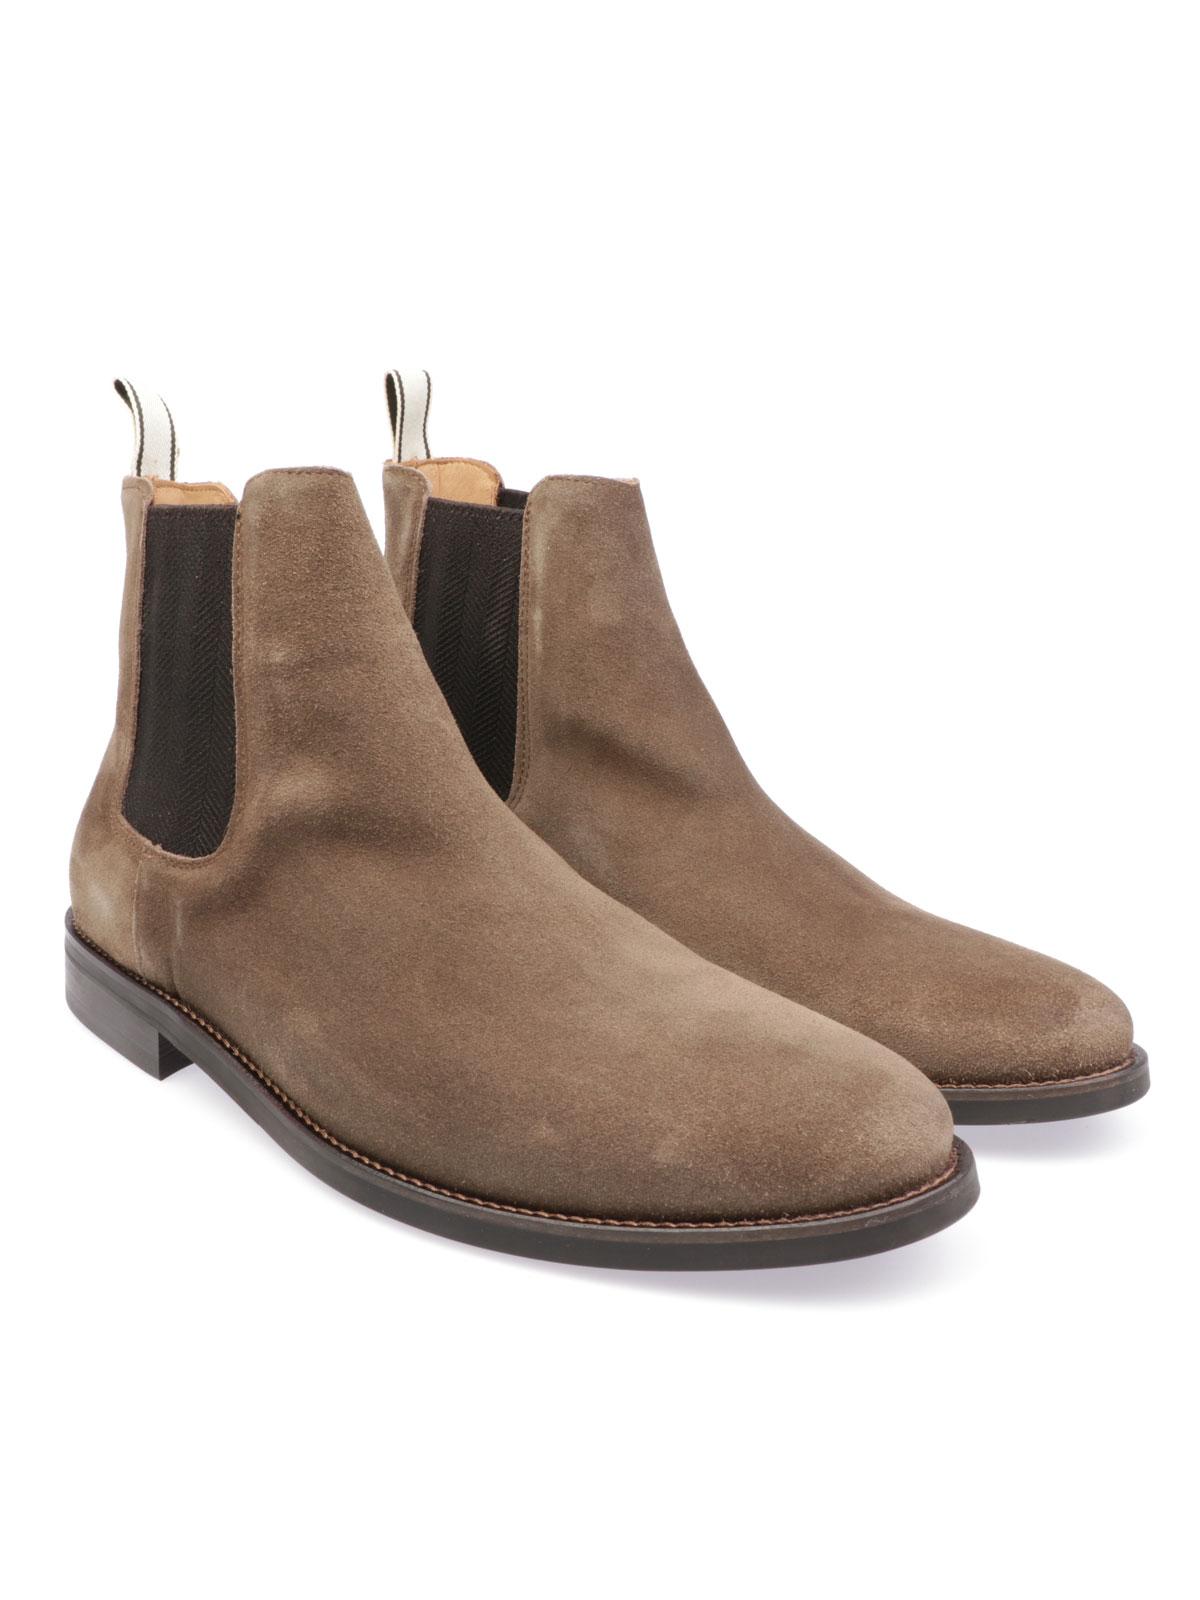 Picture of GANT   Men's Sharpville Boots